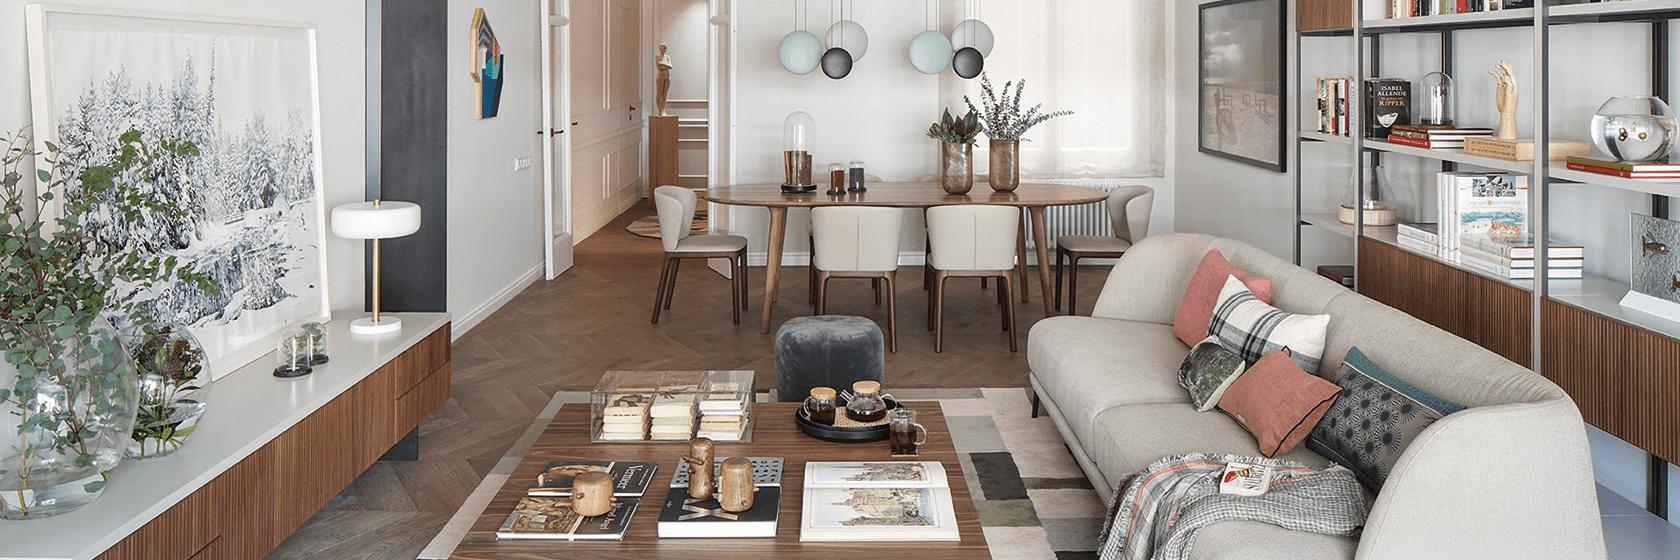 London Design Awards 2020 | The Room Studio